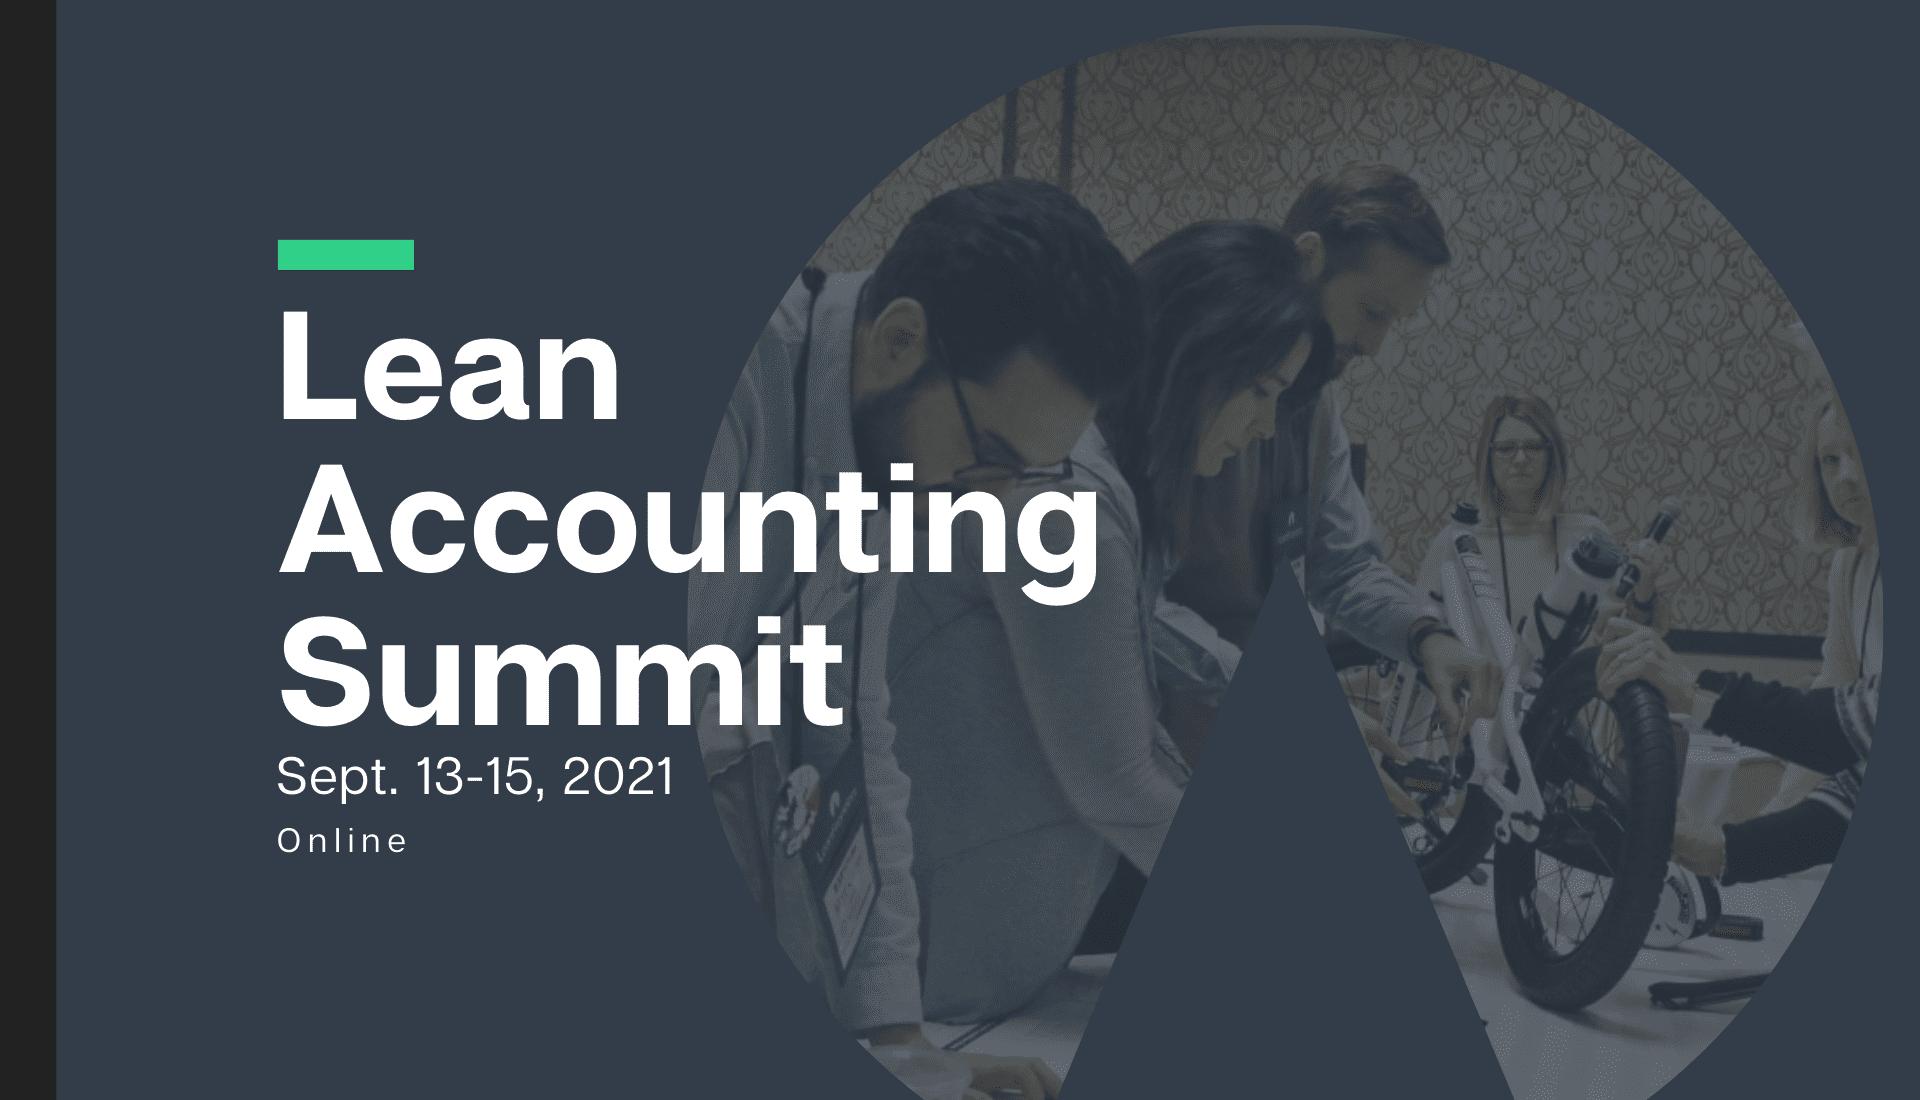 Lean Accounting Summit